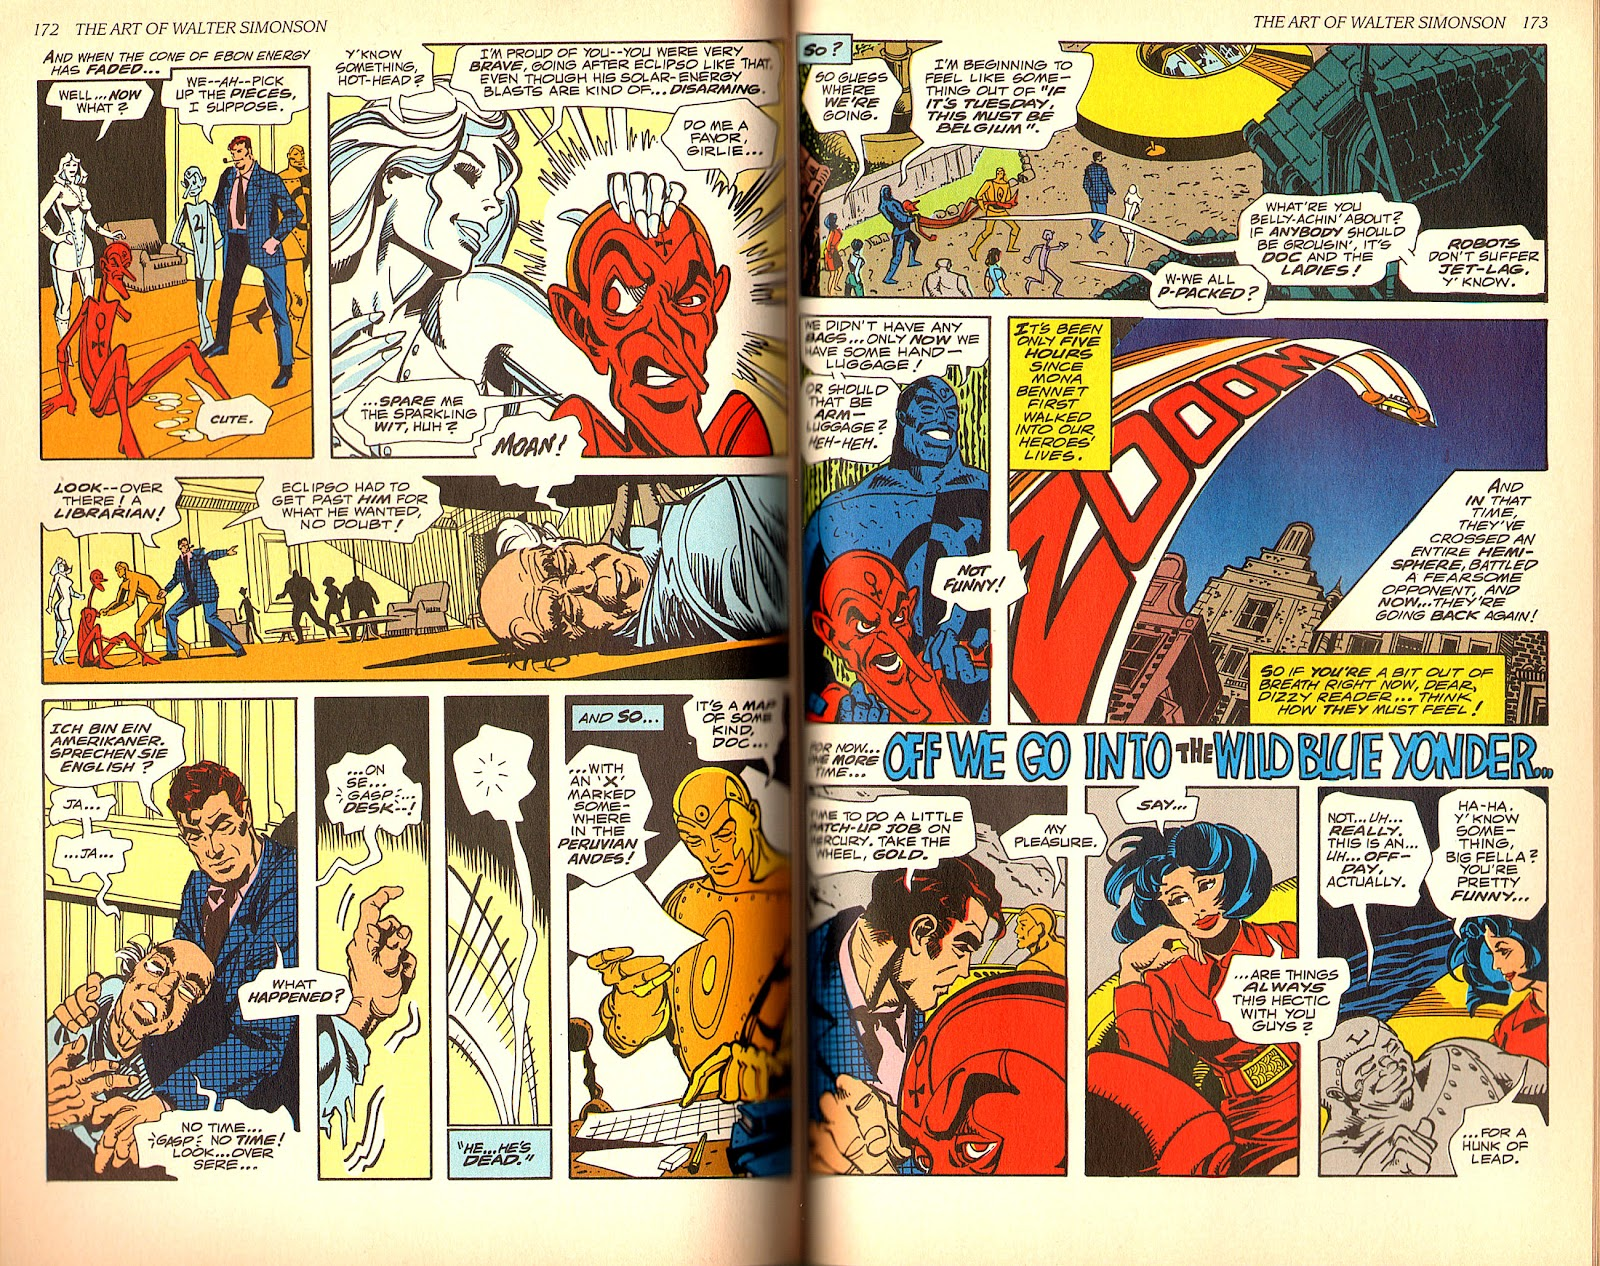 Read online The Art of Walter Simonson comic -  Issue # TPB - 88